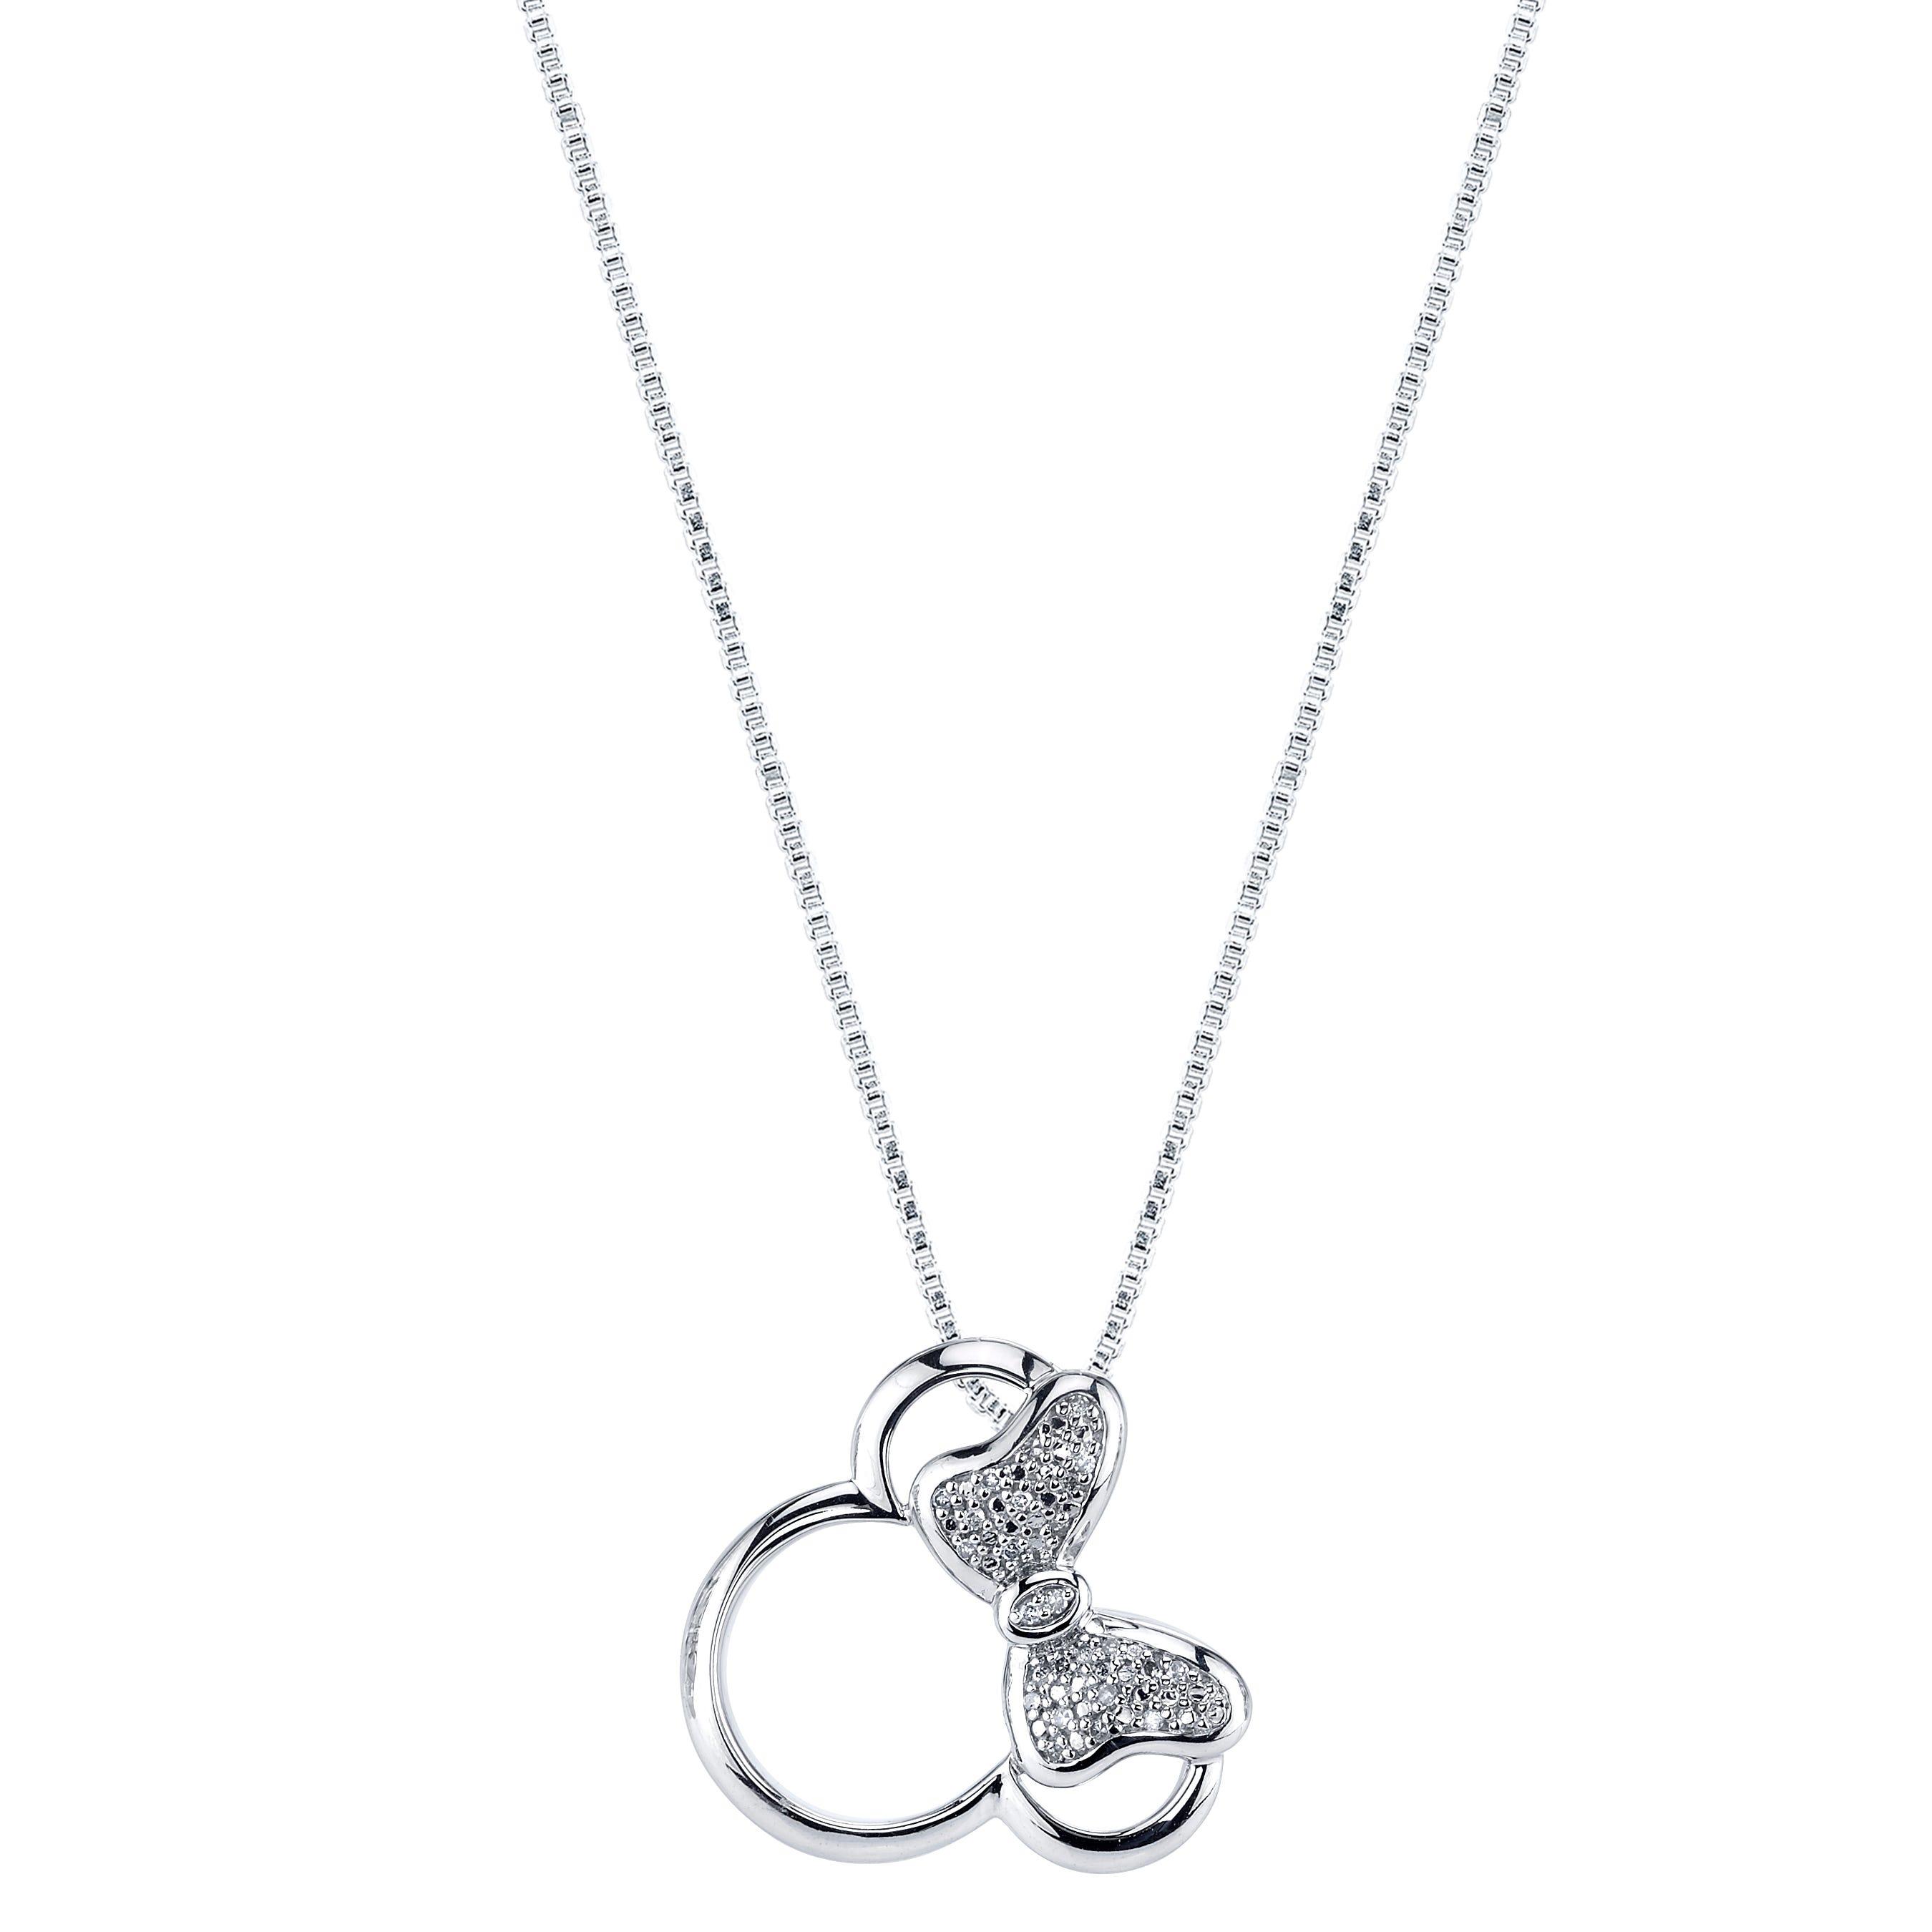 DISNEY© Diamond Minnie Mouse Bow Necklace 18